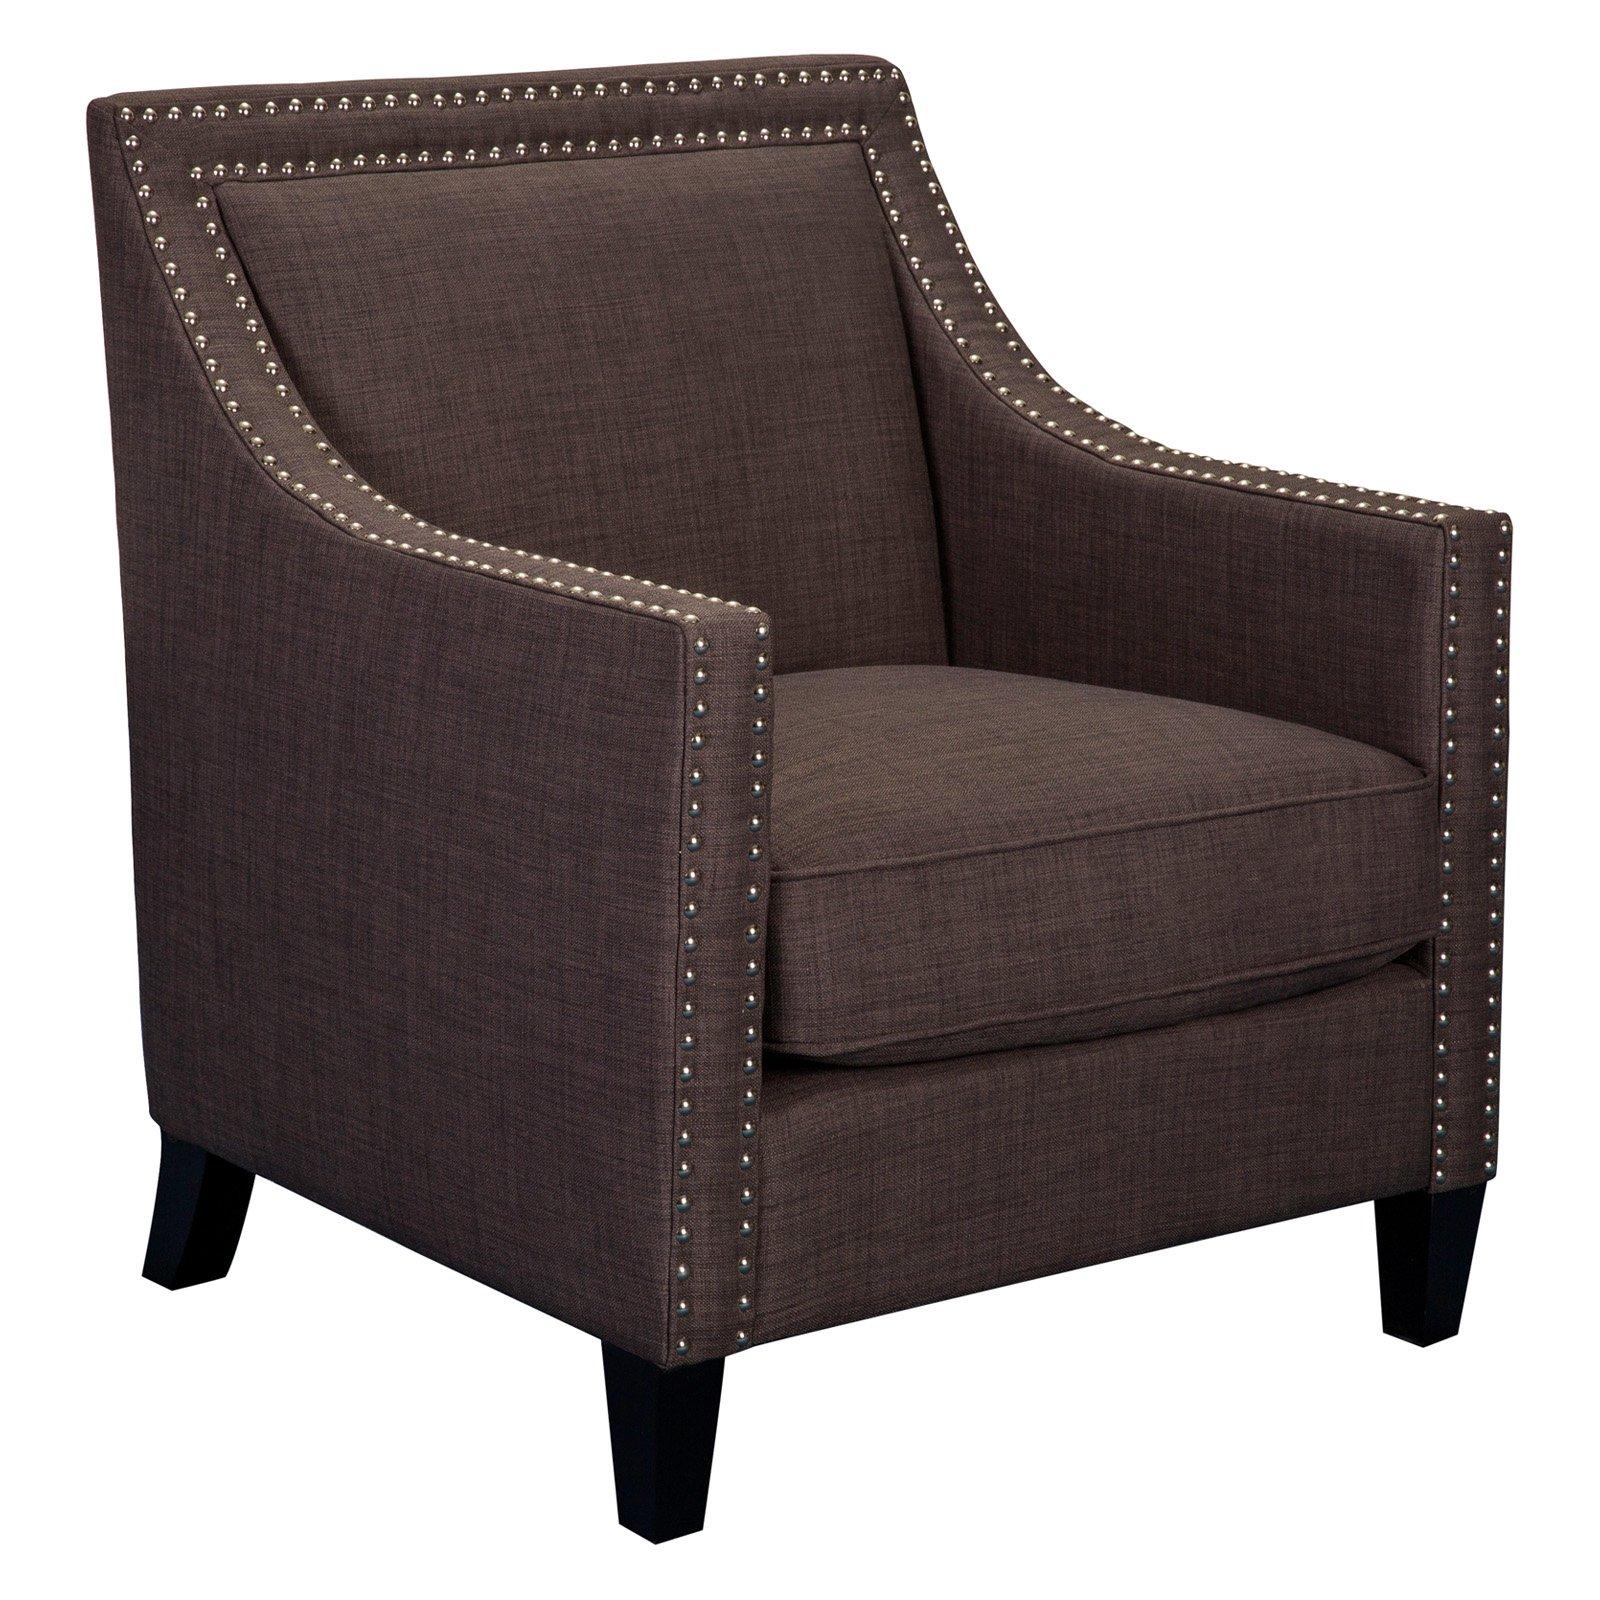 Picket House Furnishings Erica Chair with Chrome Nailhead Trim